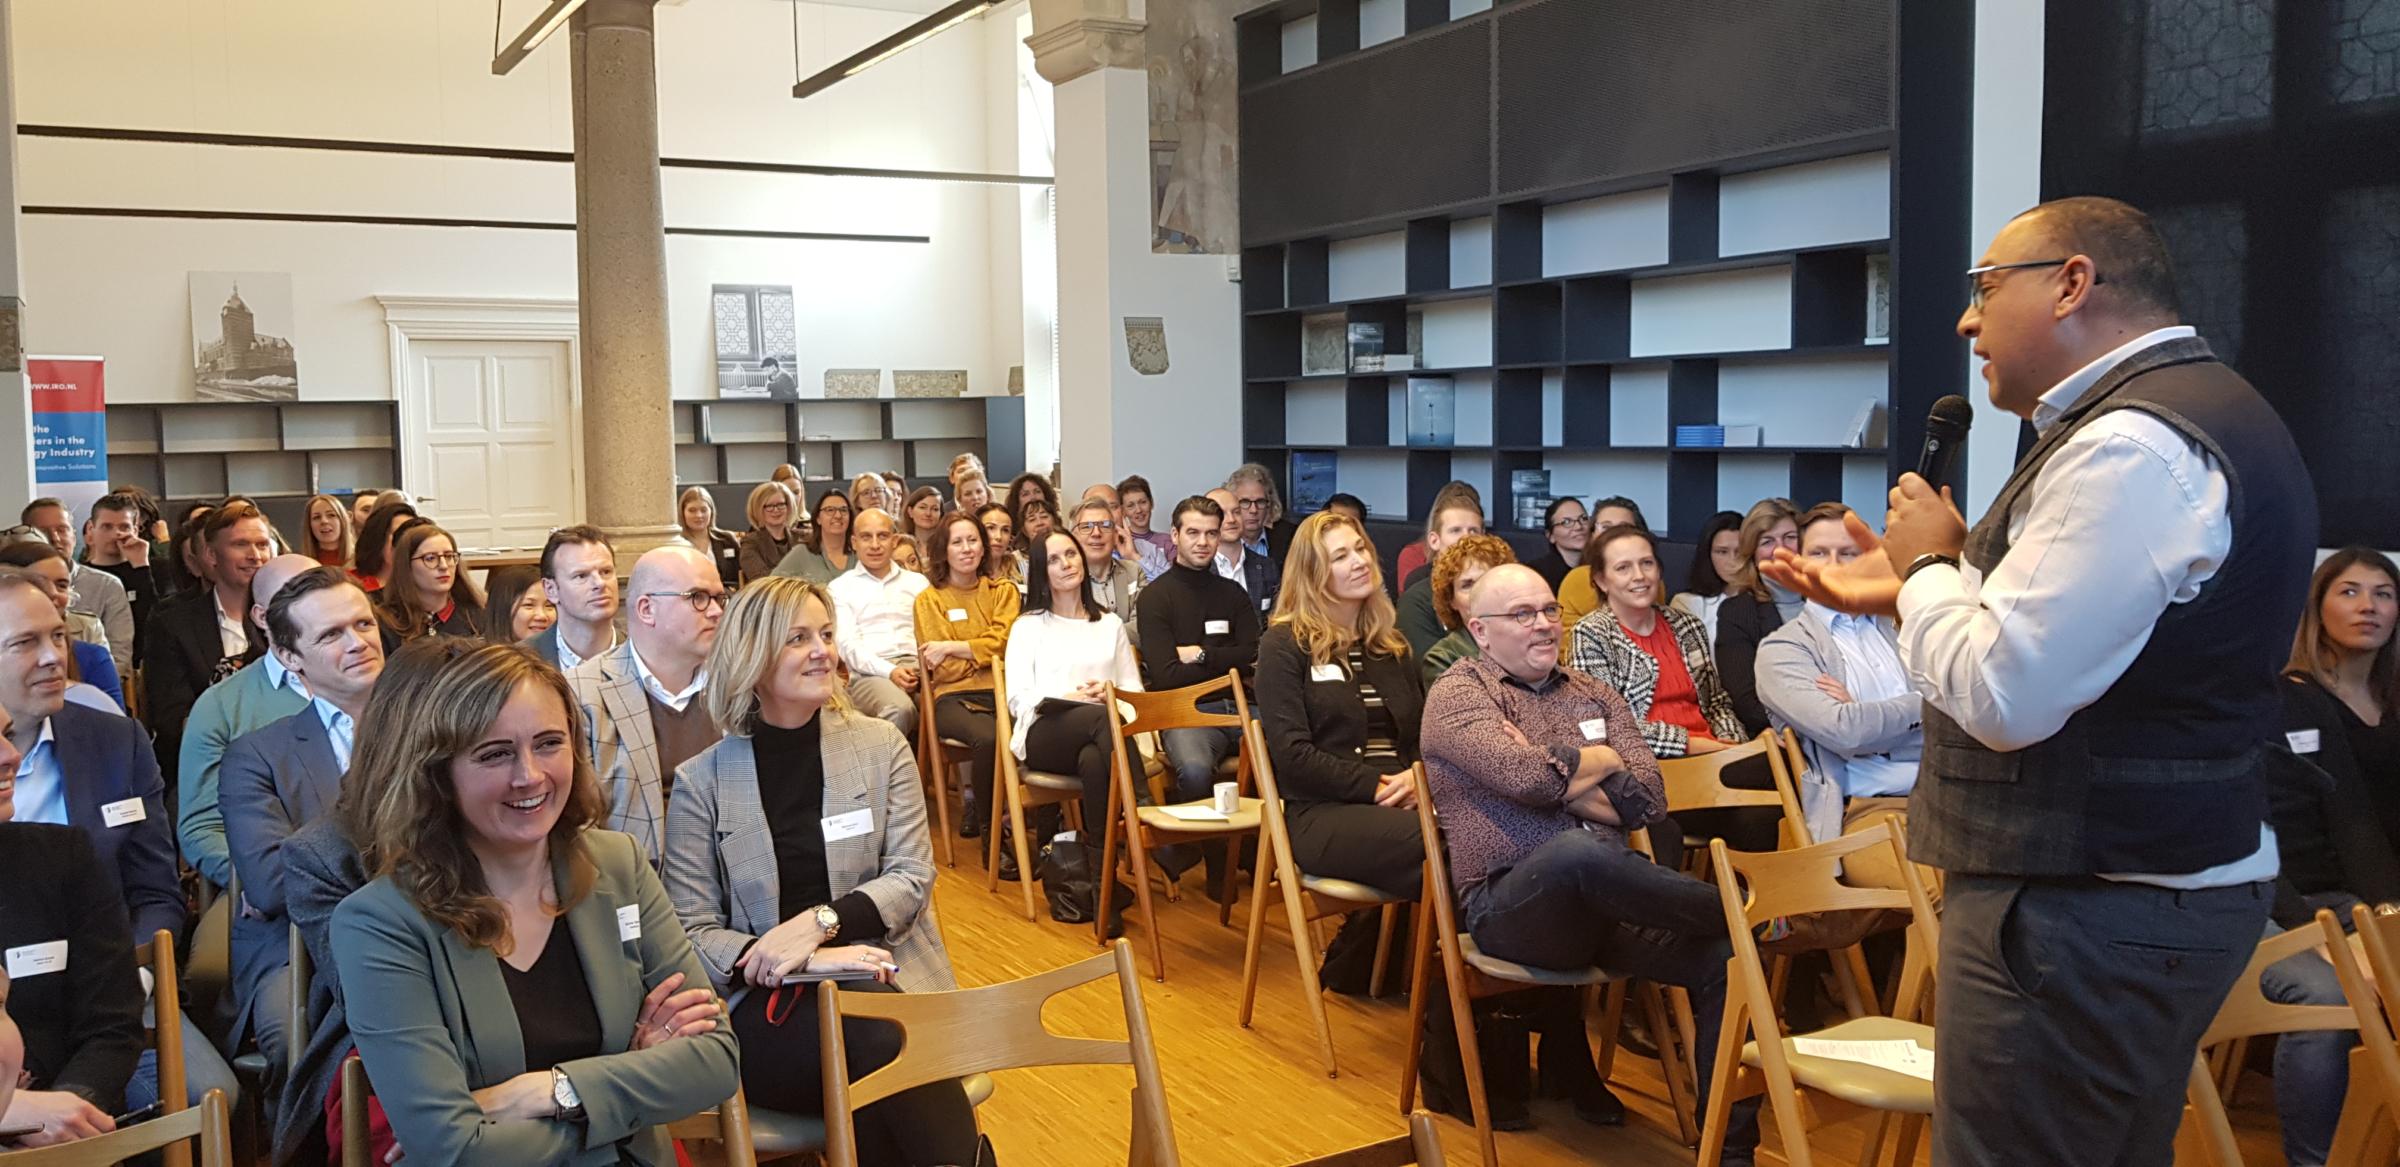 NMT-IRO MarCom event 'Digital value creation' a great success!